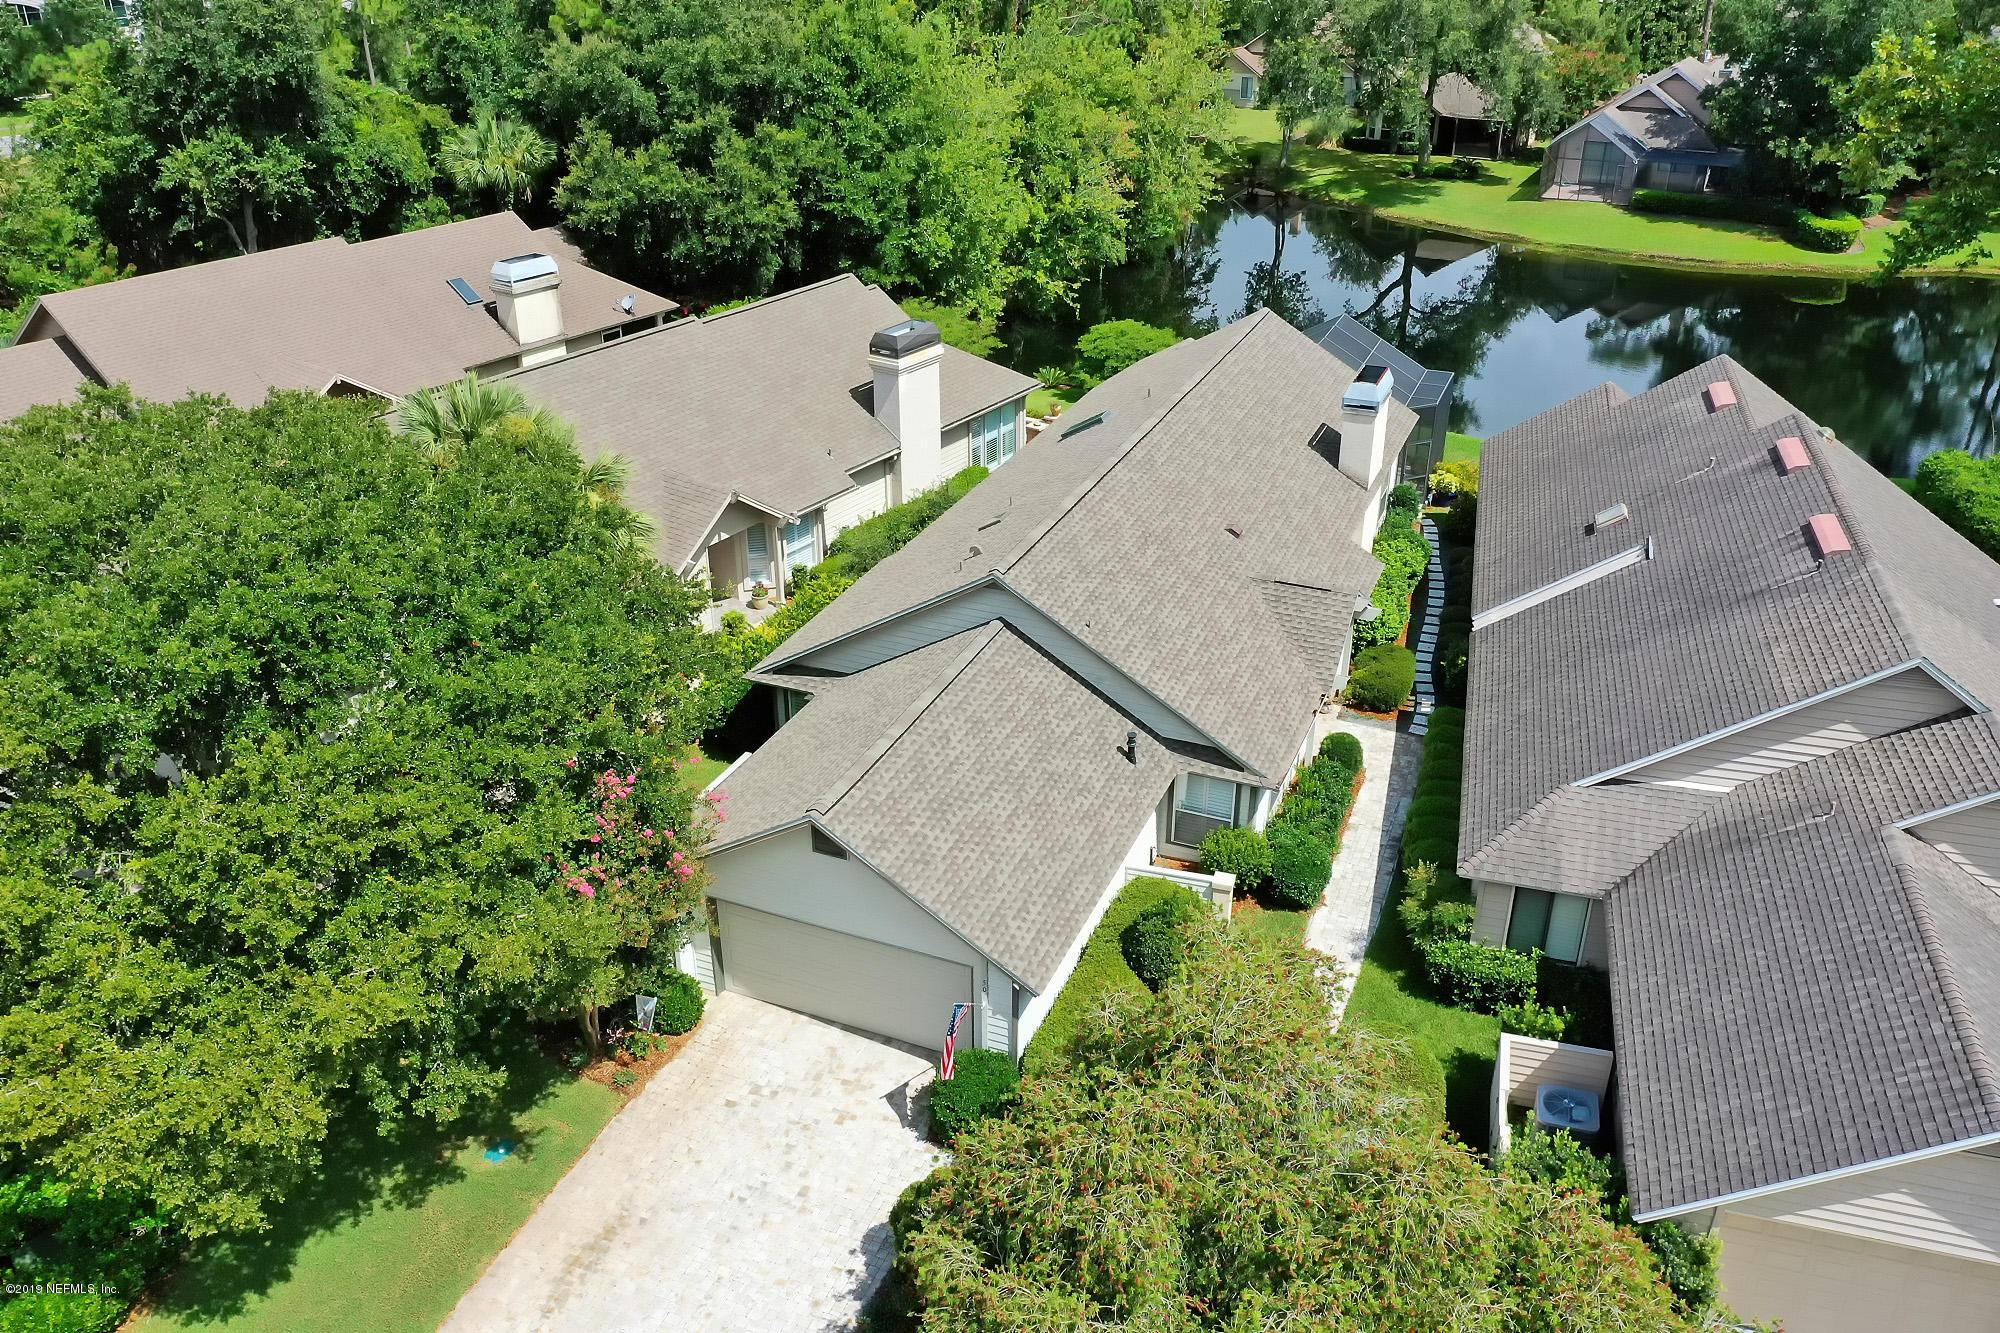 50 TROON, PONTE VEDRA BEACH, FLORIDA 32082, 3 Bedrooms Bedrooms, ,2 BathroomsBathrooms,Residential - single family,For sale,TROON,1008304